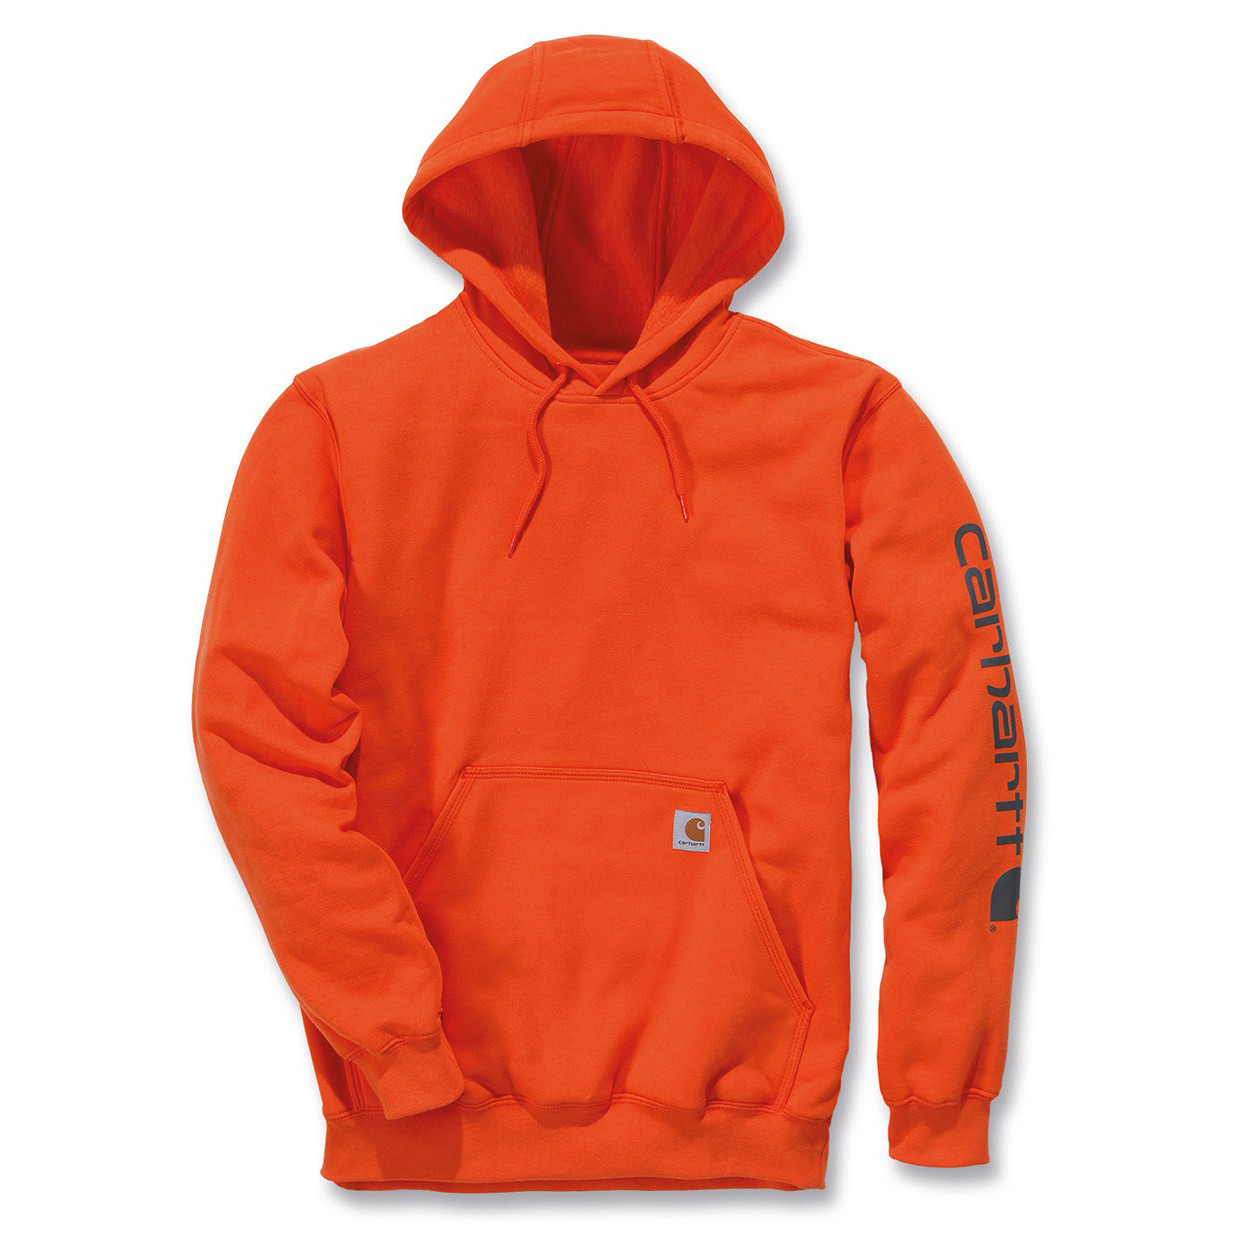 Худи Carhartt Sleeve Logo Hooded Sweatshirt - K288 (Orange, XL)